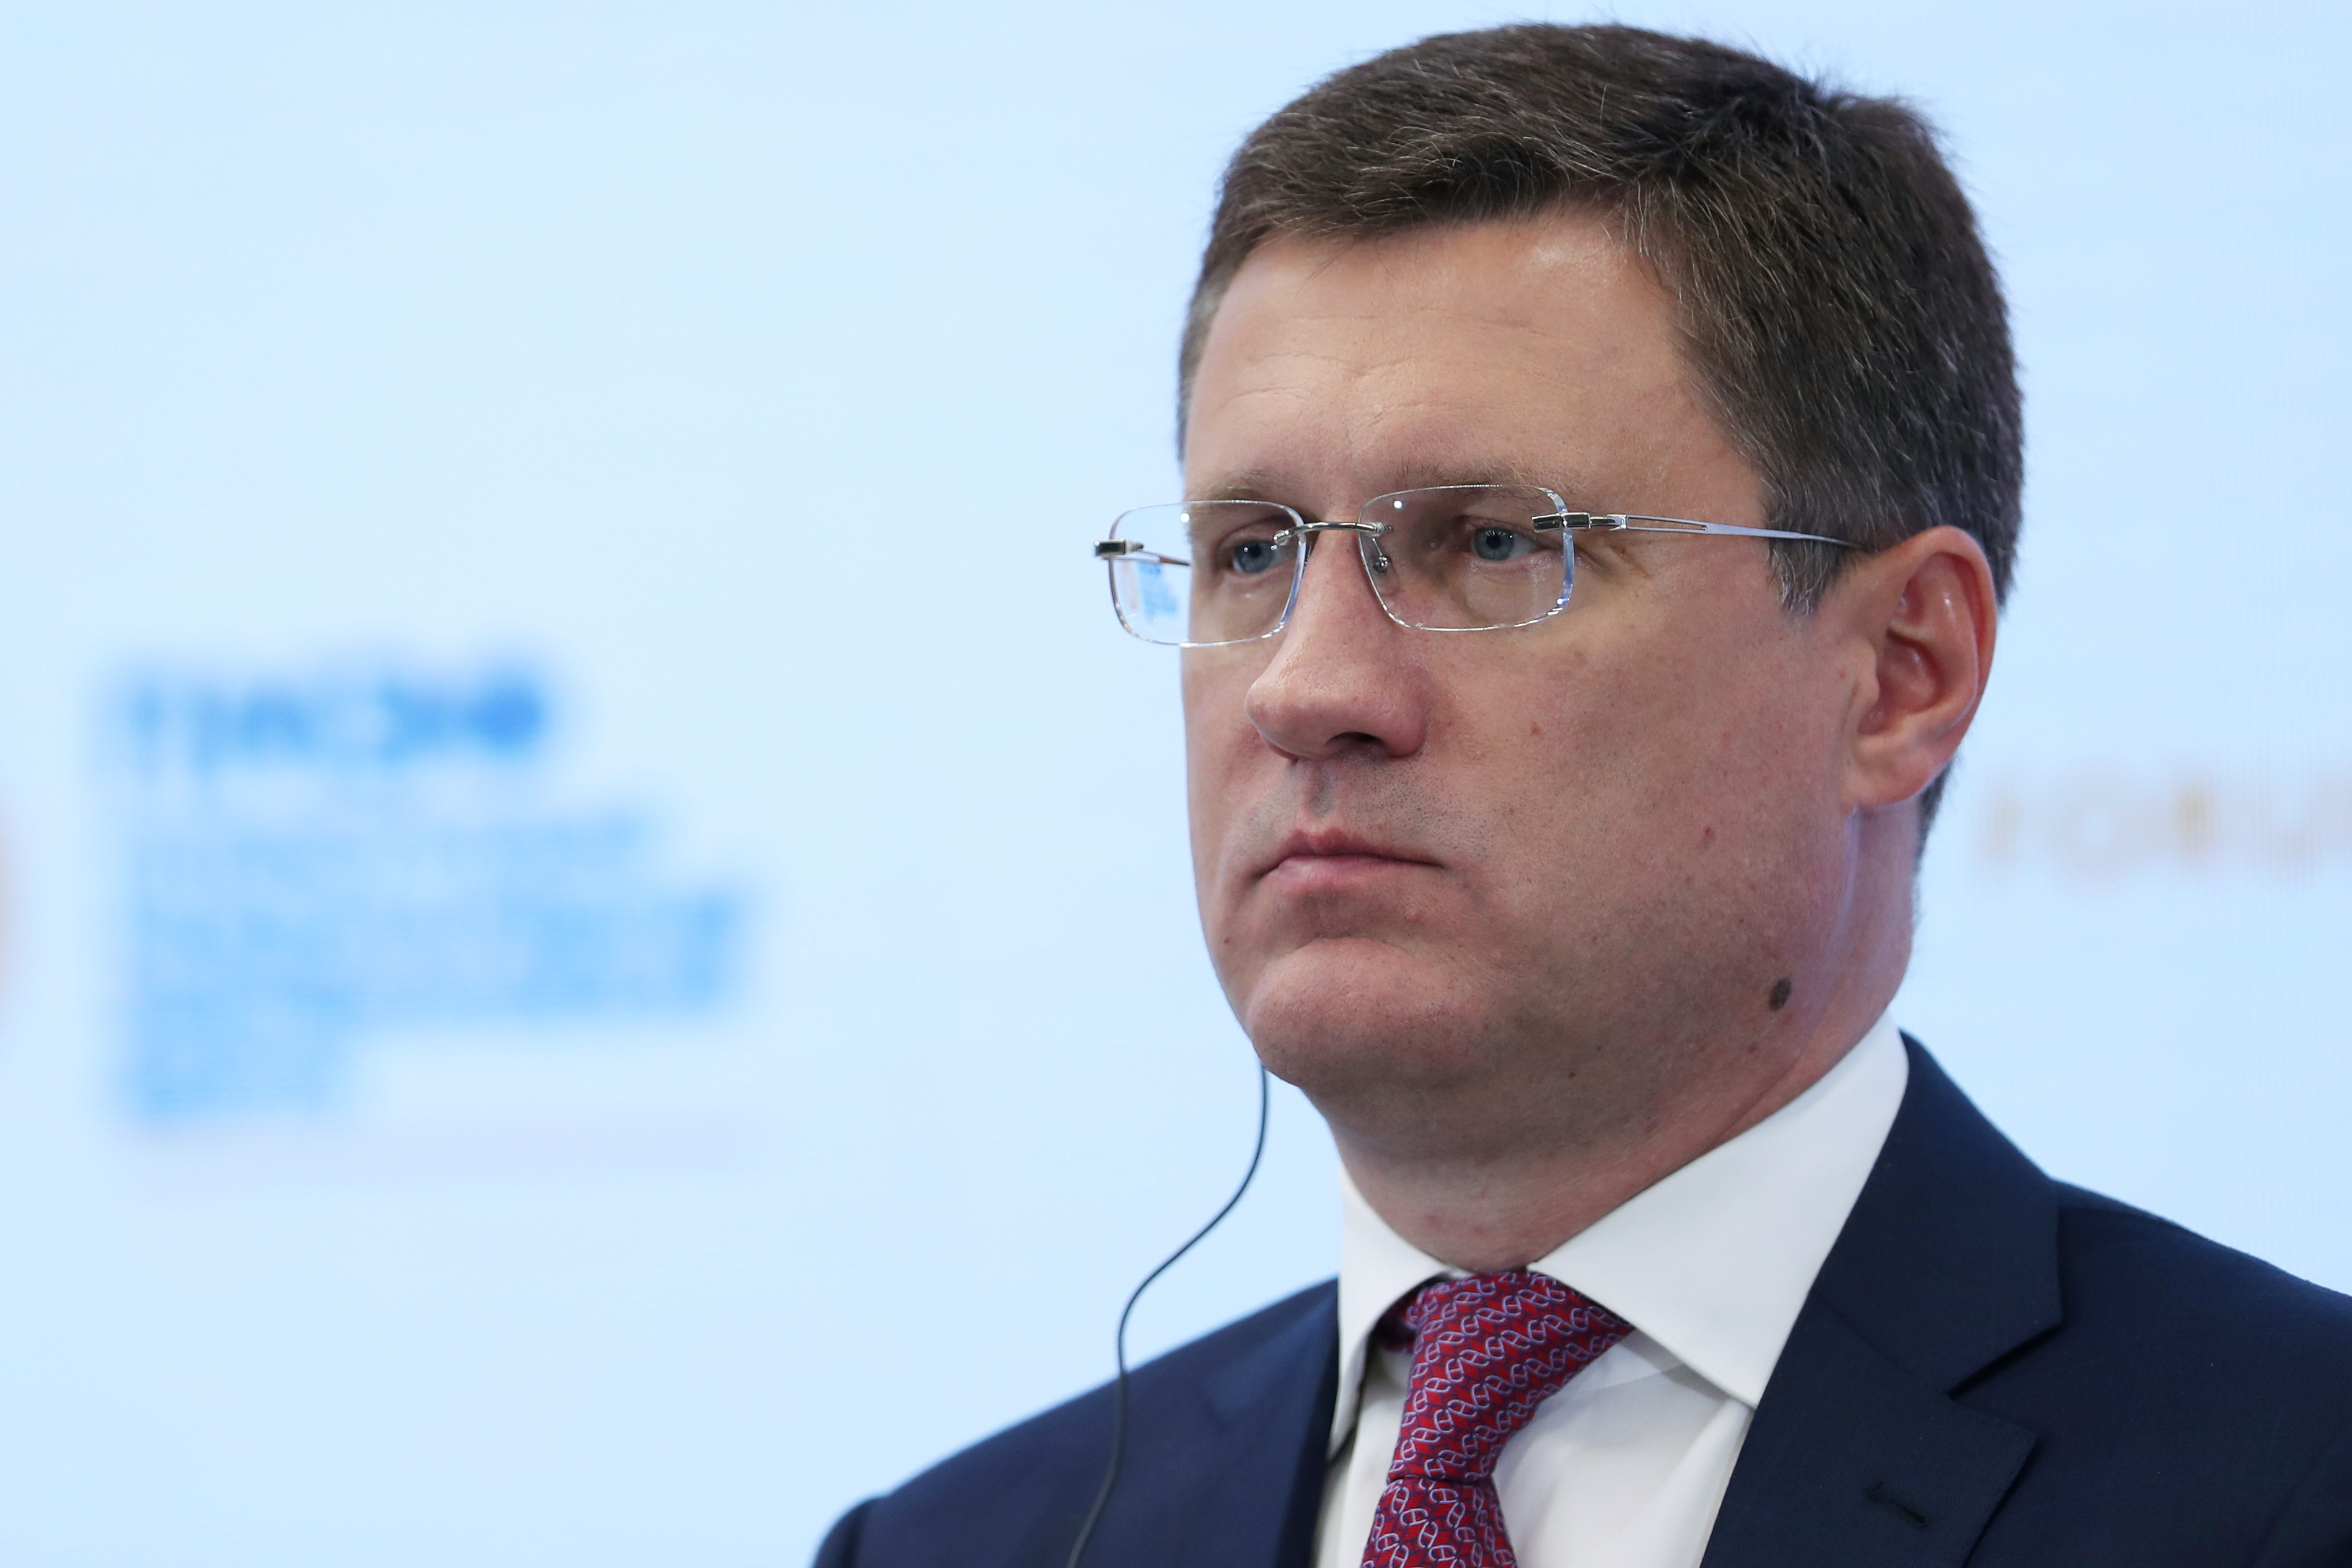 Russian Deputy Prime Minister Alexander Novak attends a session of the St. Petersburg International Economic Forum (SPIEF) in Saint Petersburg, Russia, June 4, 2021. REUTERS/Evgenia Novozhenina/Files